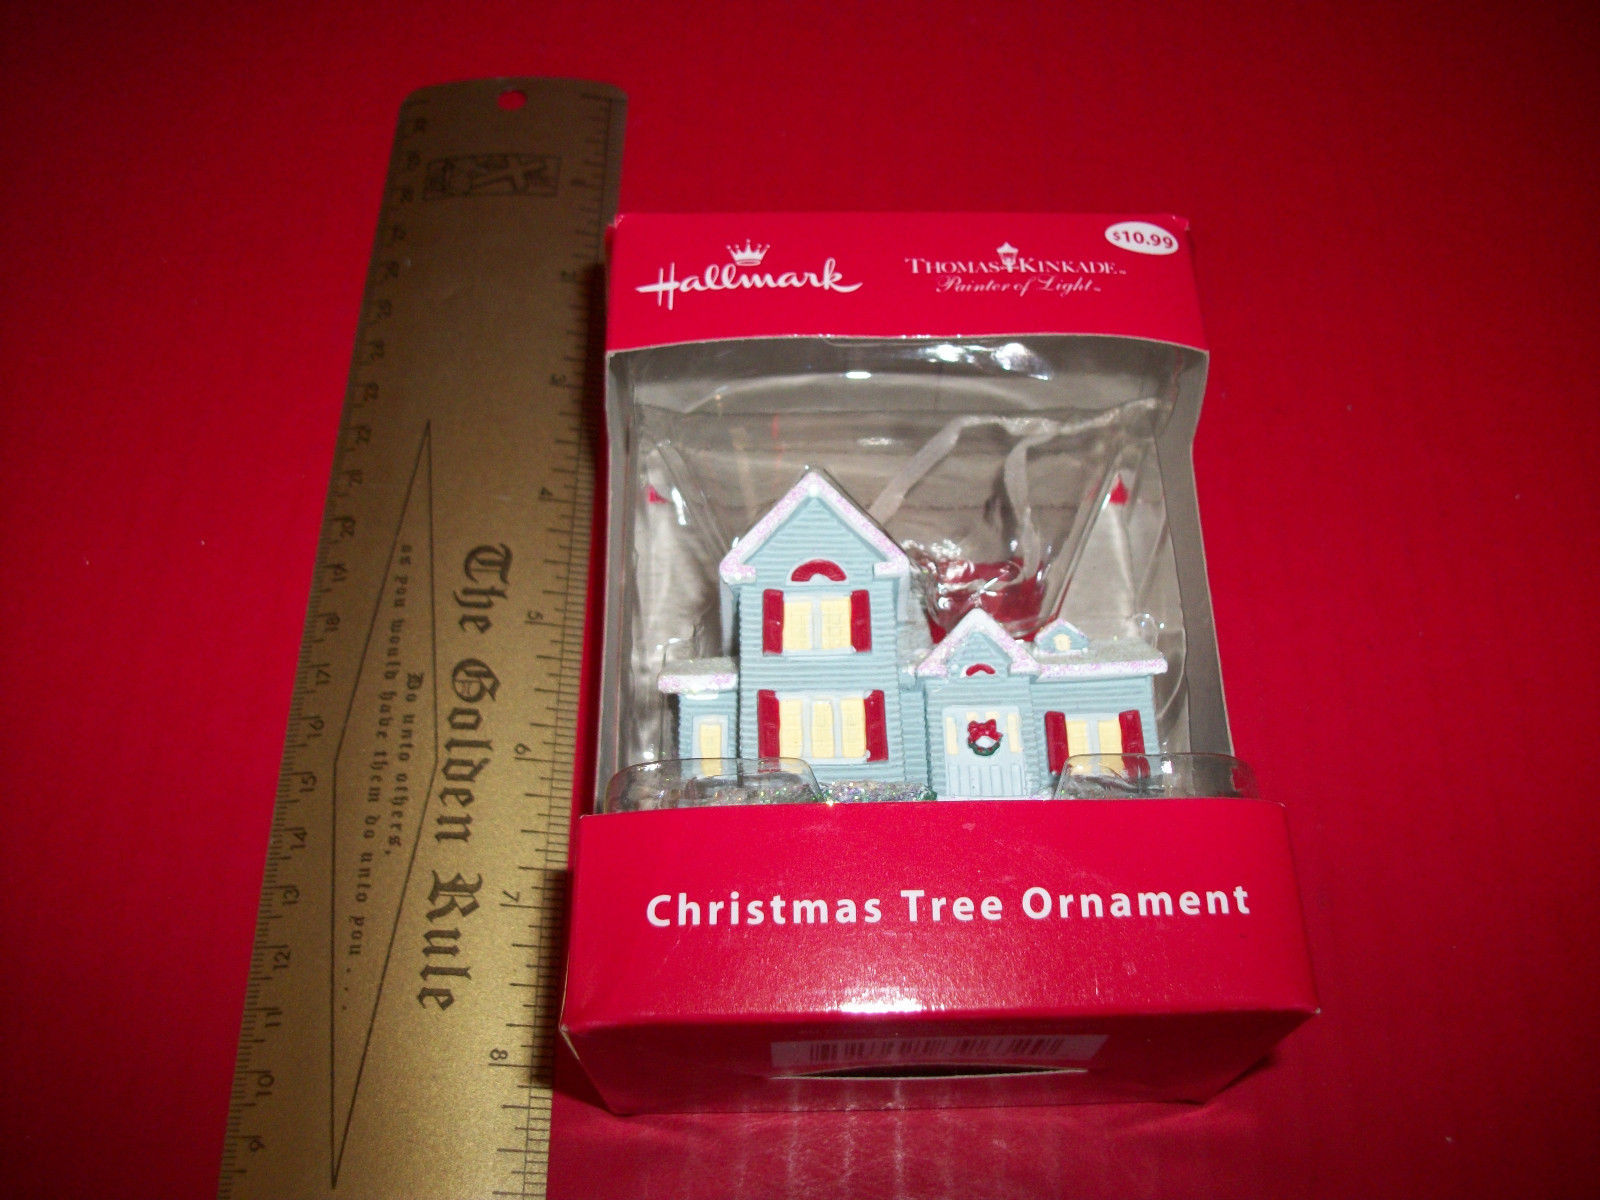 Home Holiday Hallmark Decor Thomas Kinkade Blue House Christmas Tree Ornament